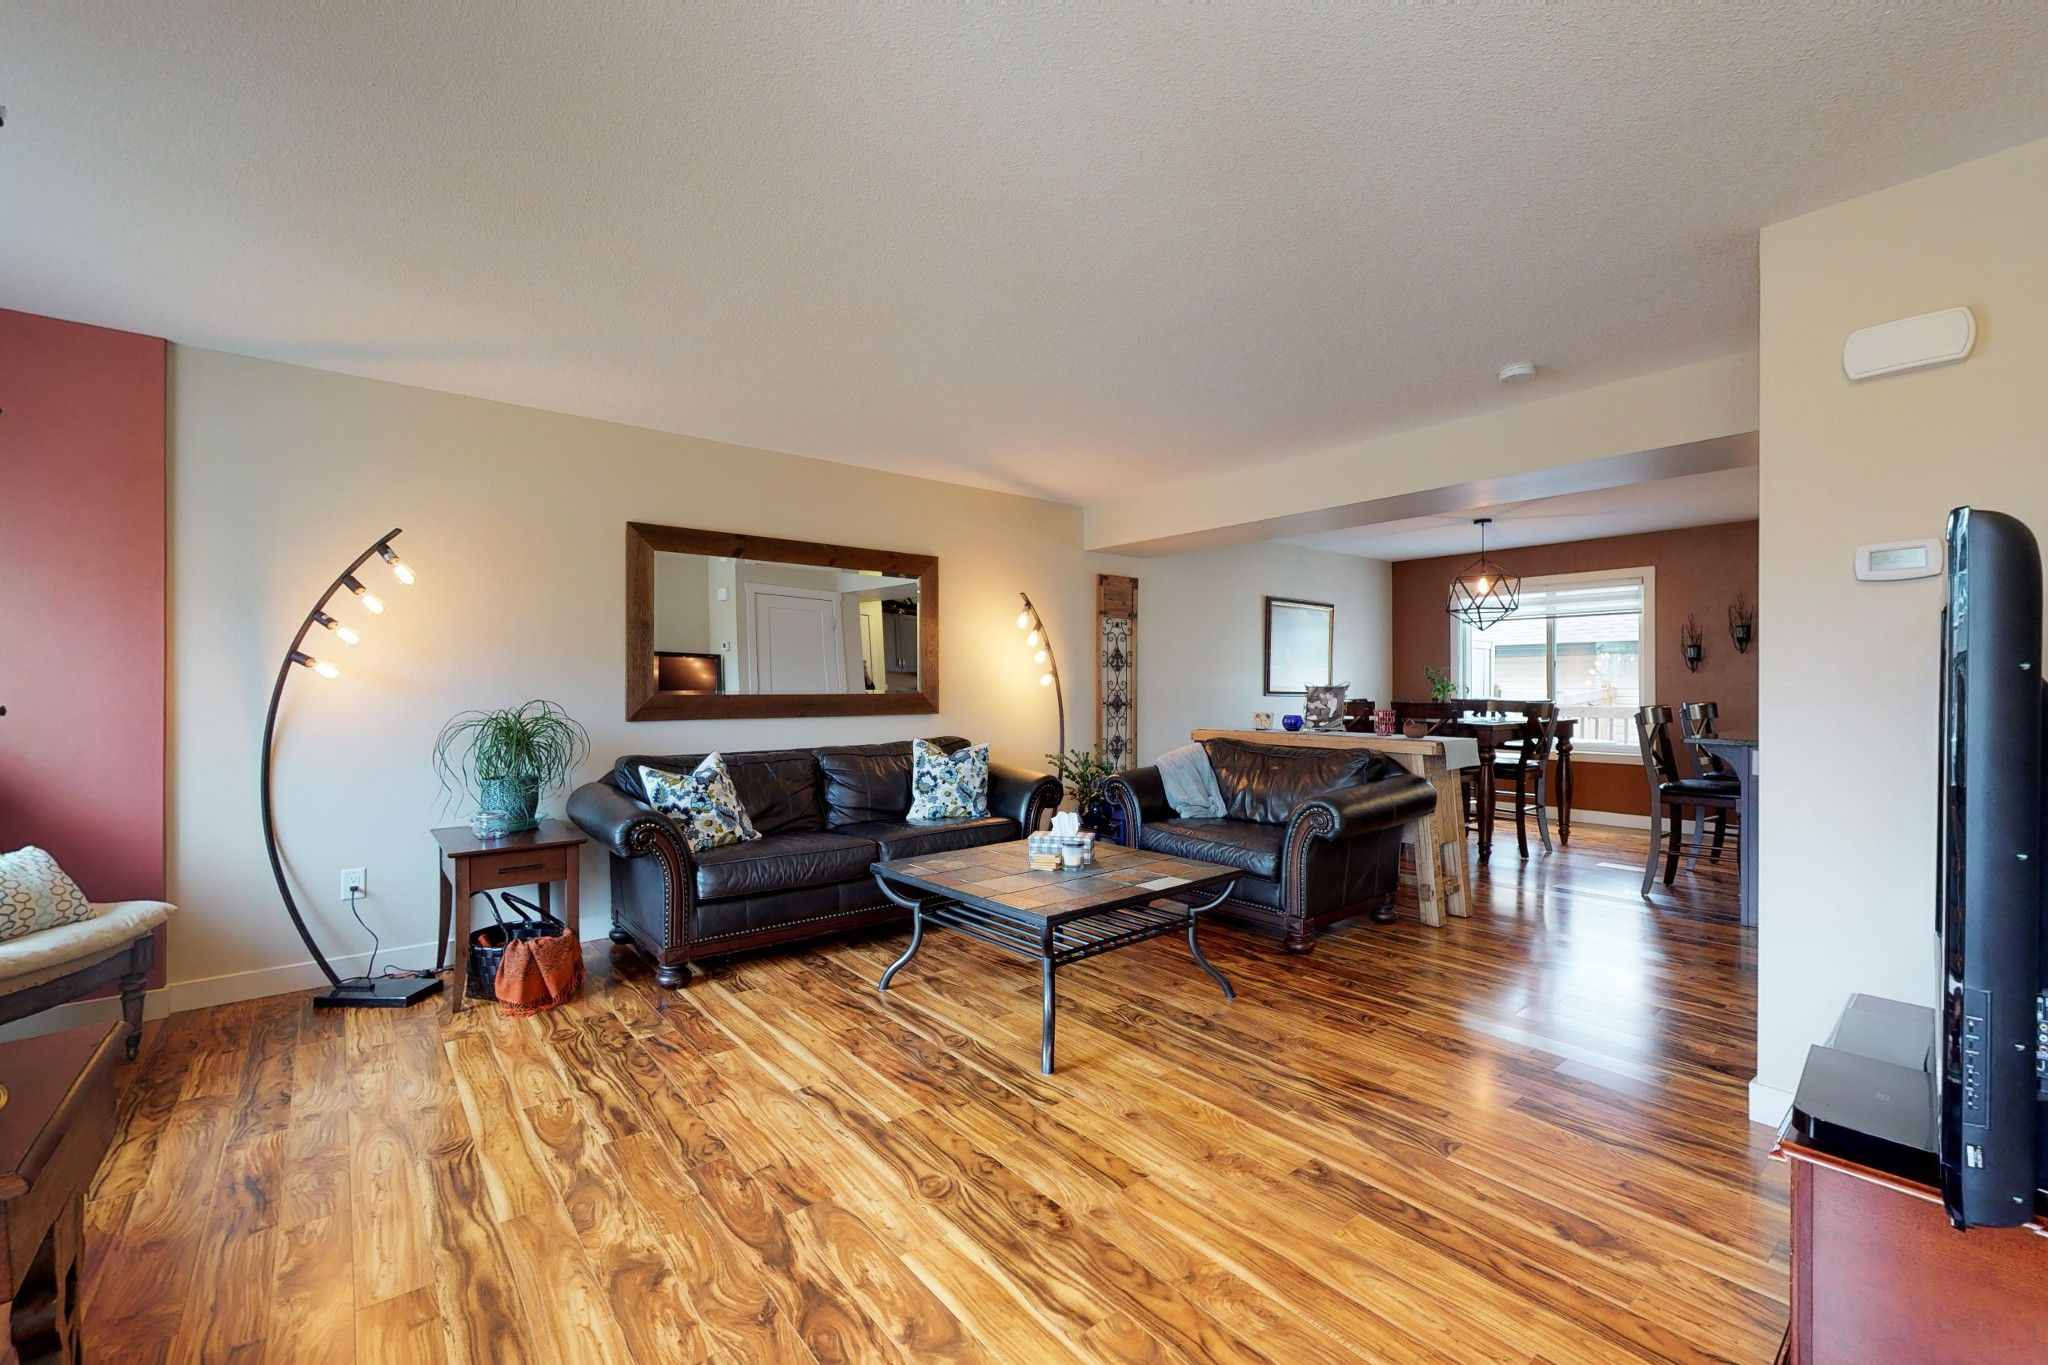 Main Photo: 120 Cy Becker BLVD in Edmonton: House Half Duplex for sale : MLS®# E4182256